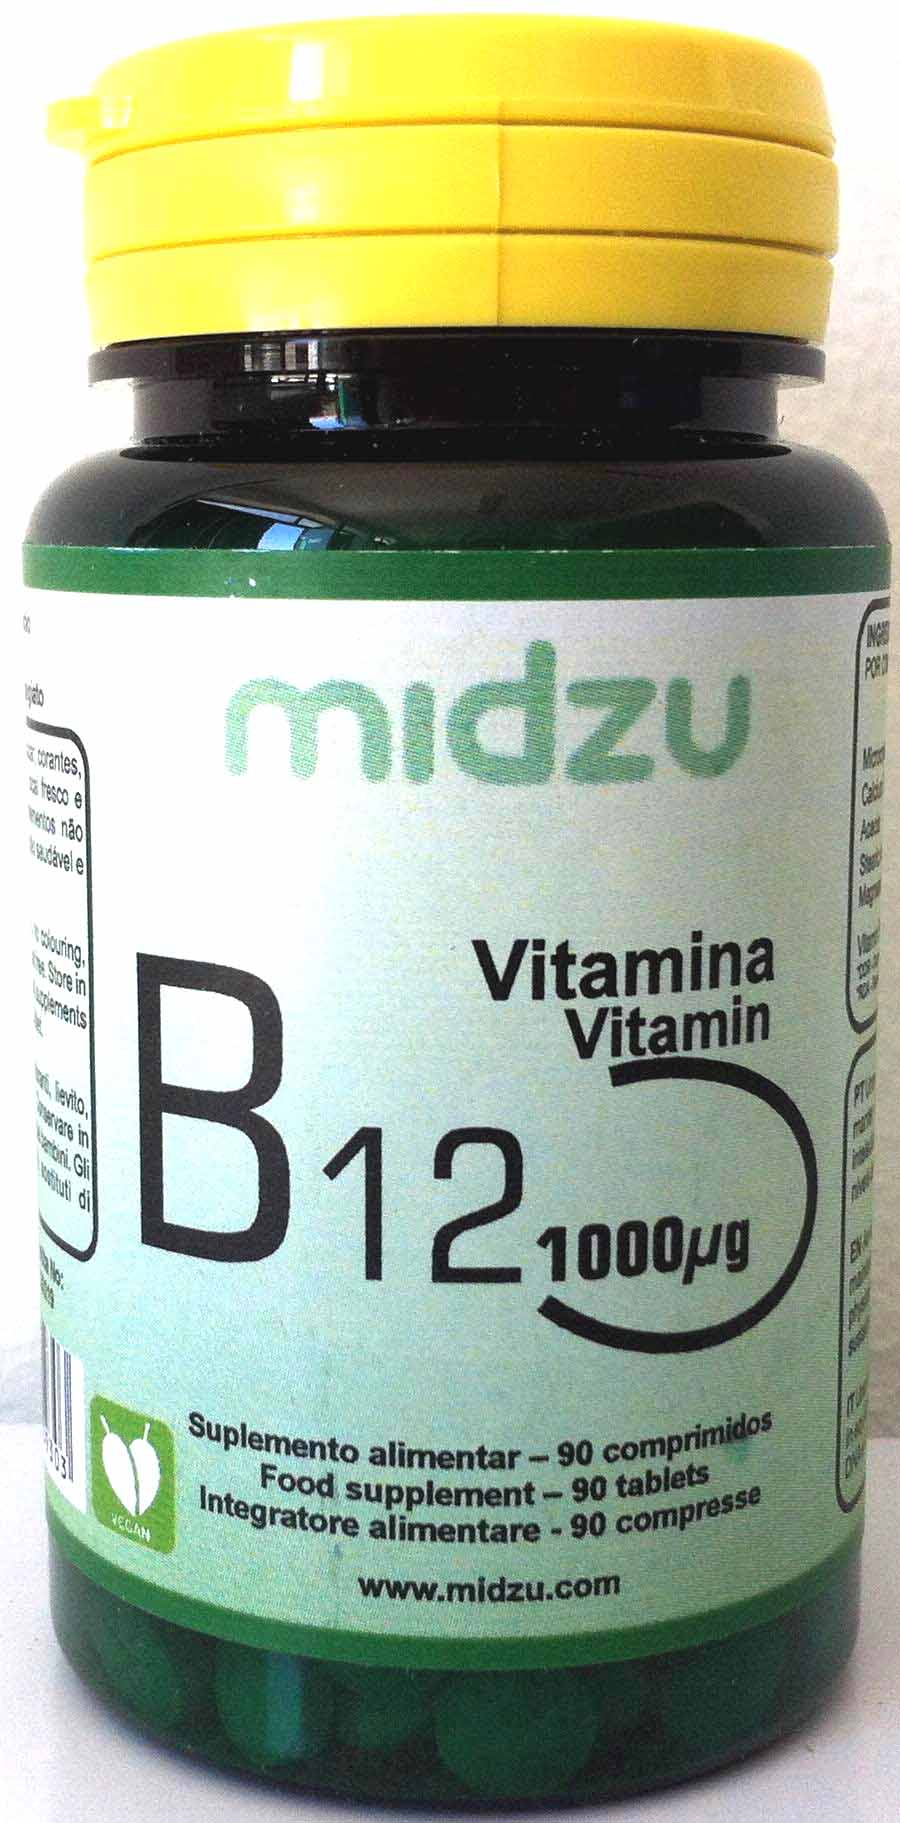 Vitamina B12 Midzu (1000ug)